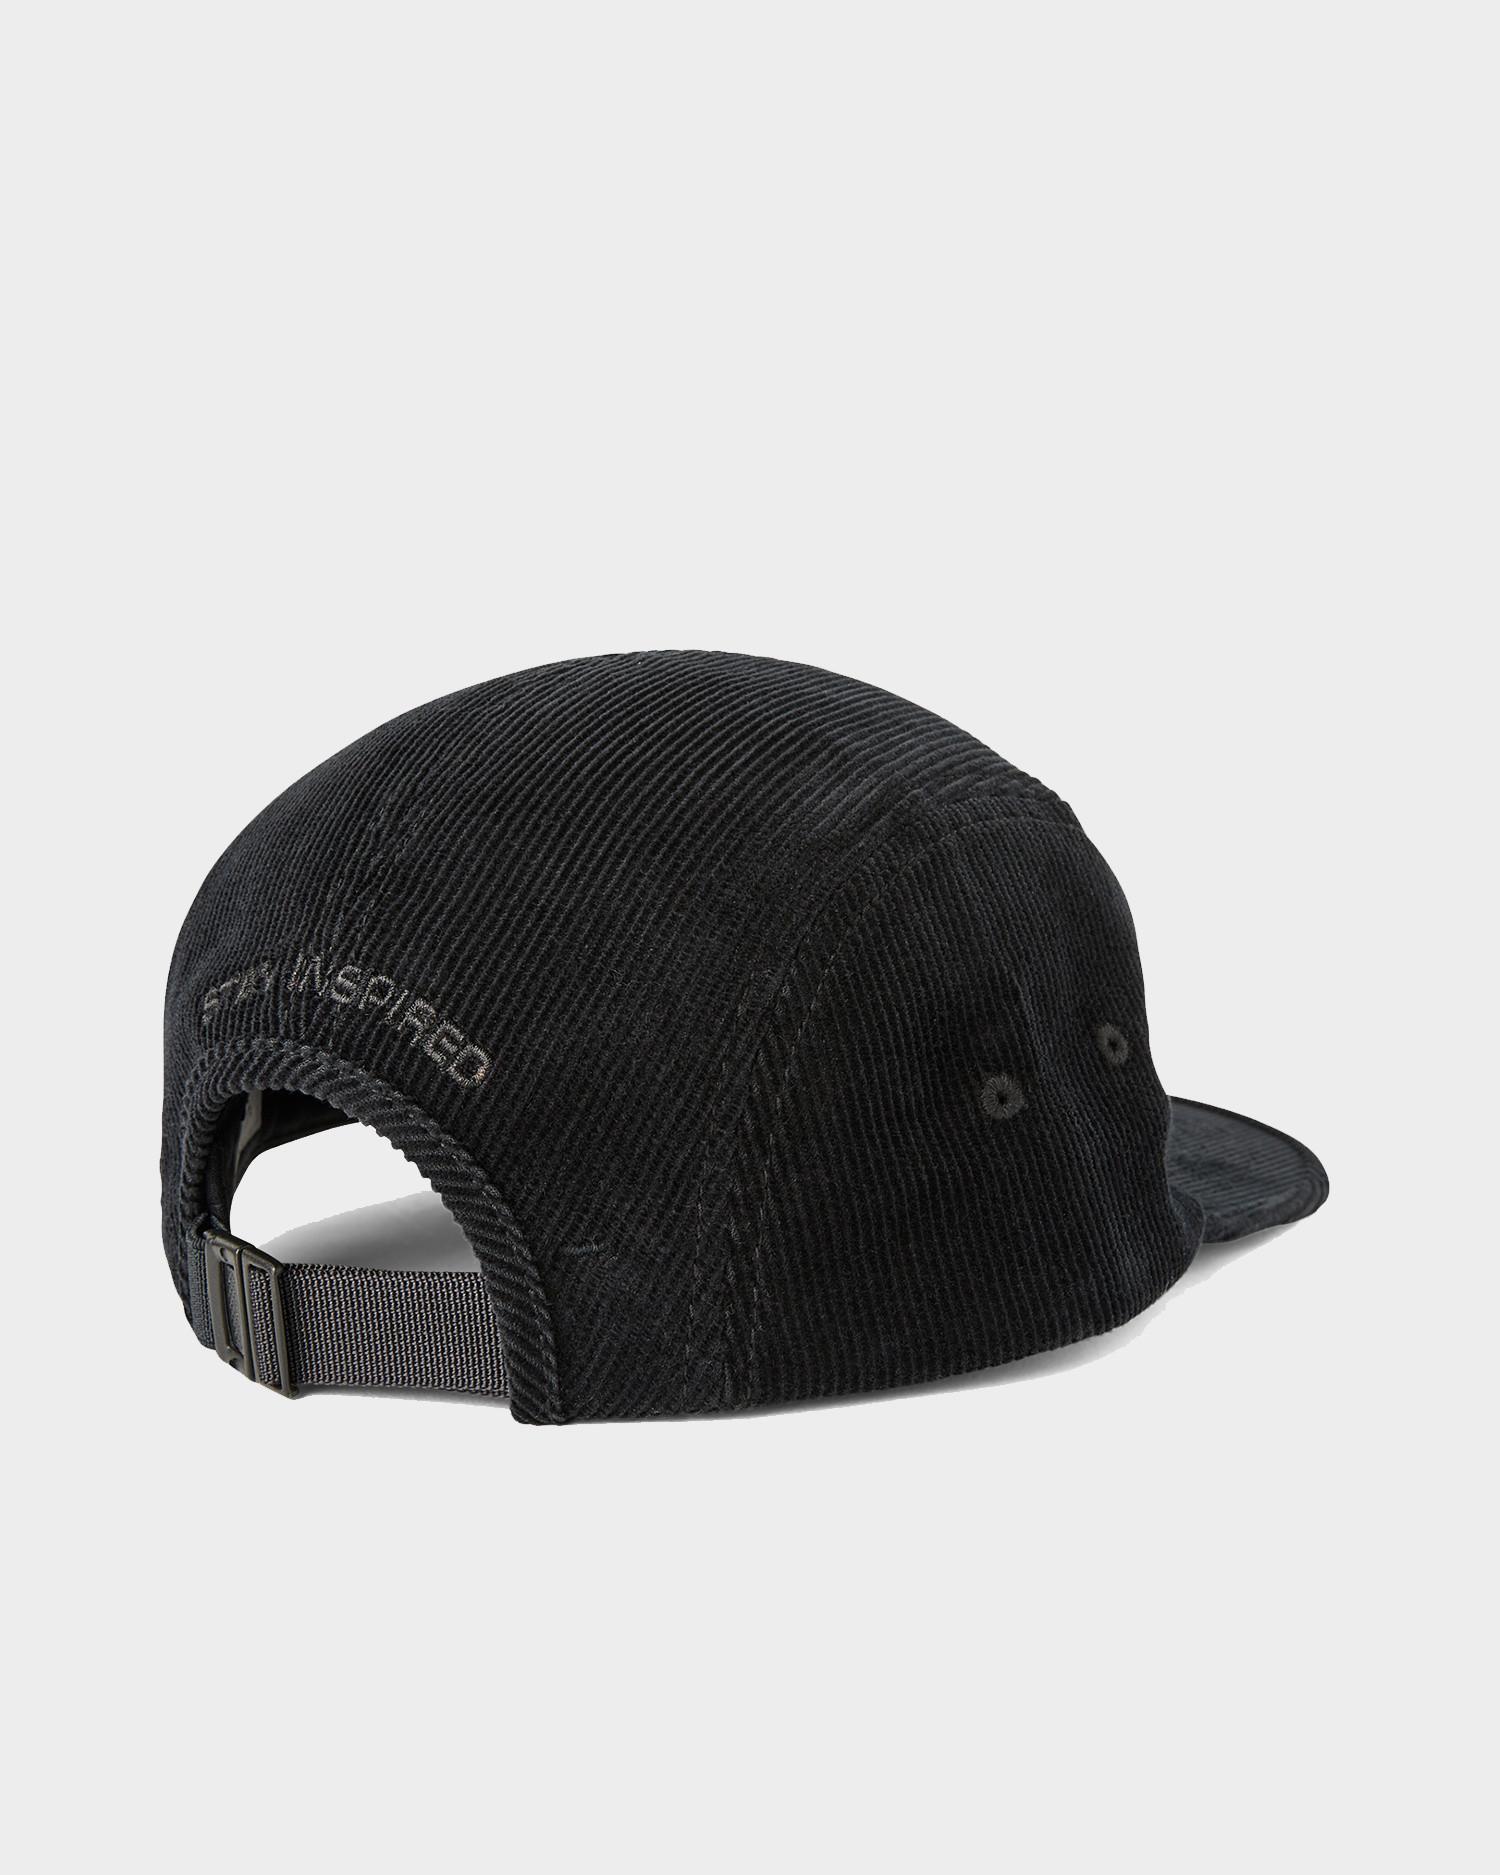 Polar Cord Speed Co Cap Black